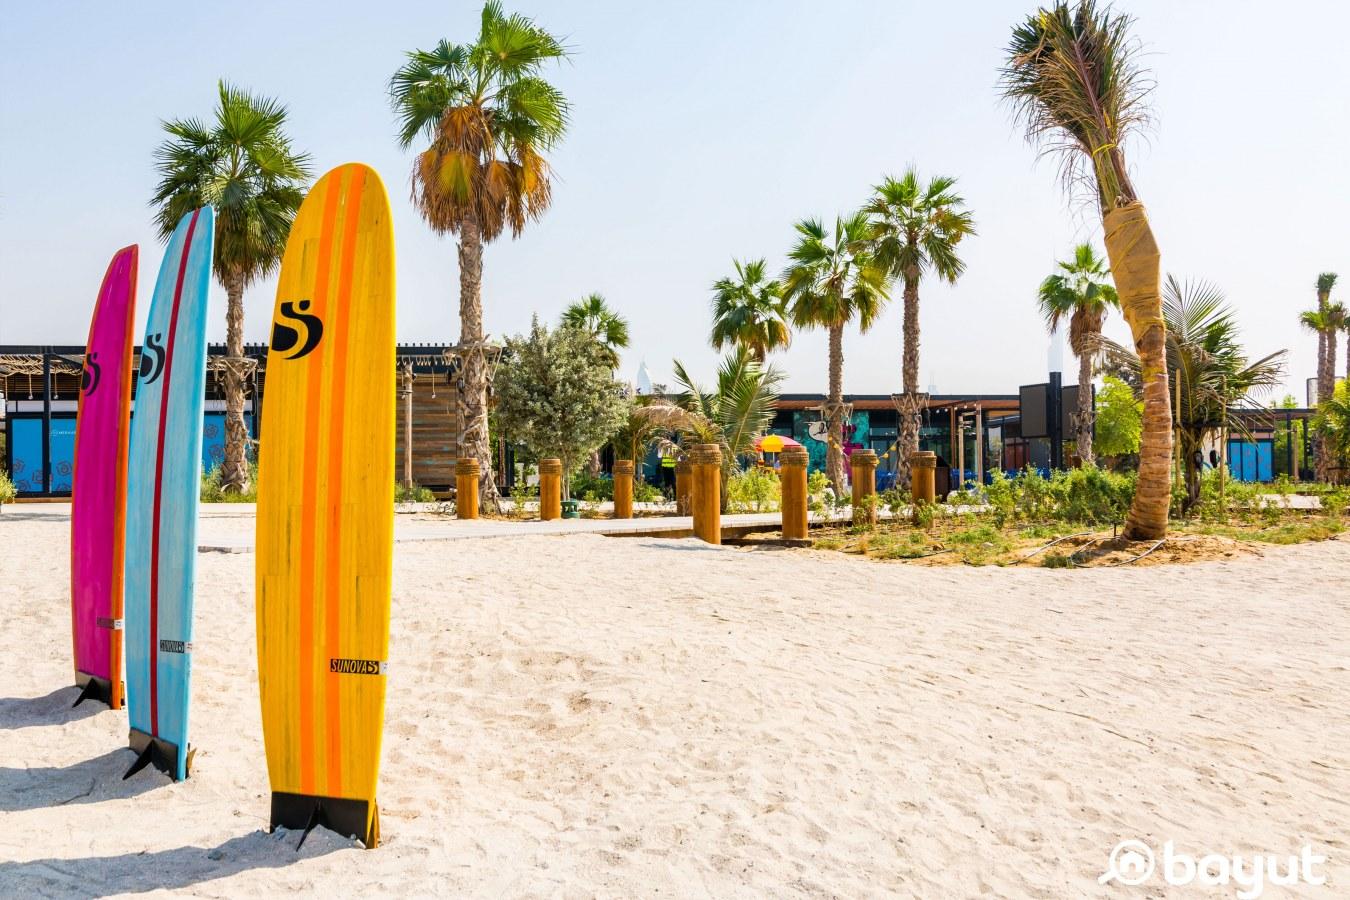 Three surf boards stuck in the sand at La Mer Beach Dubai